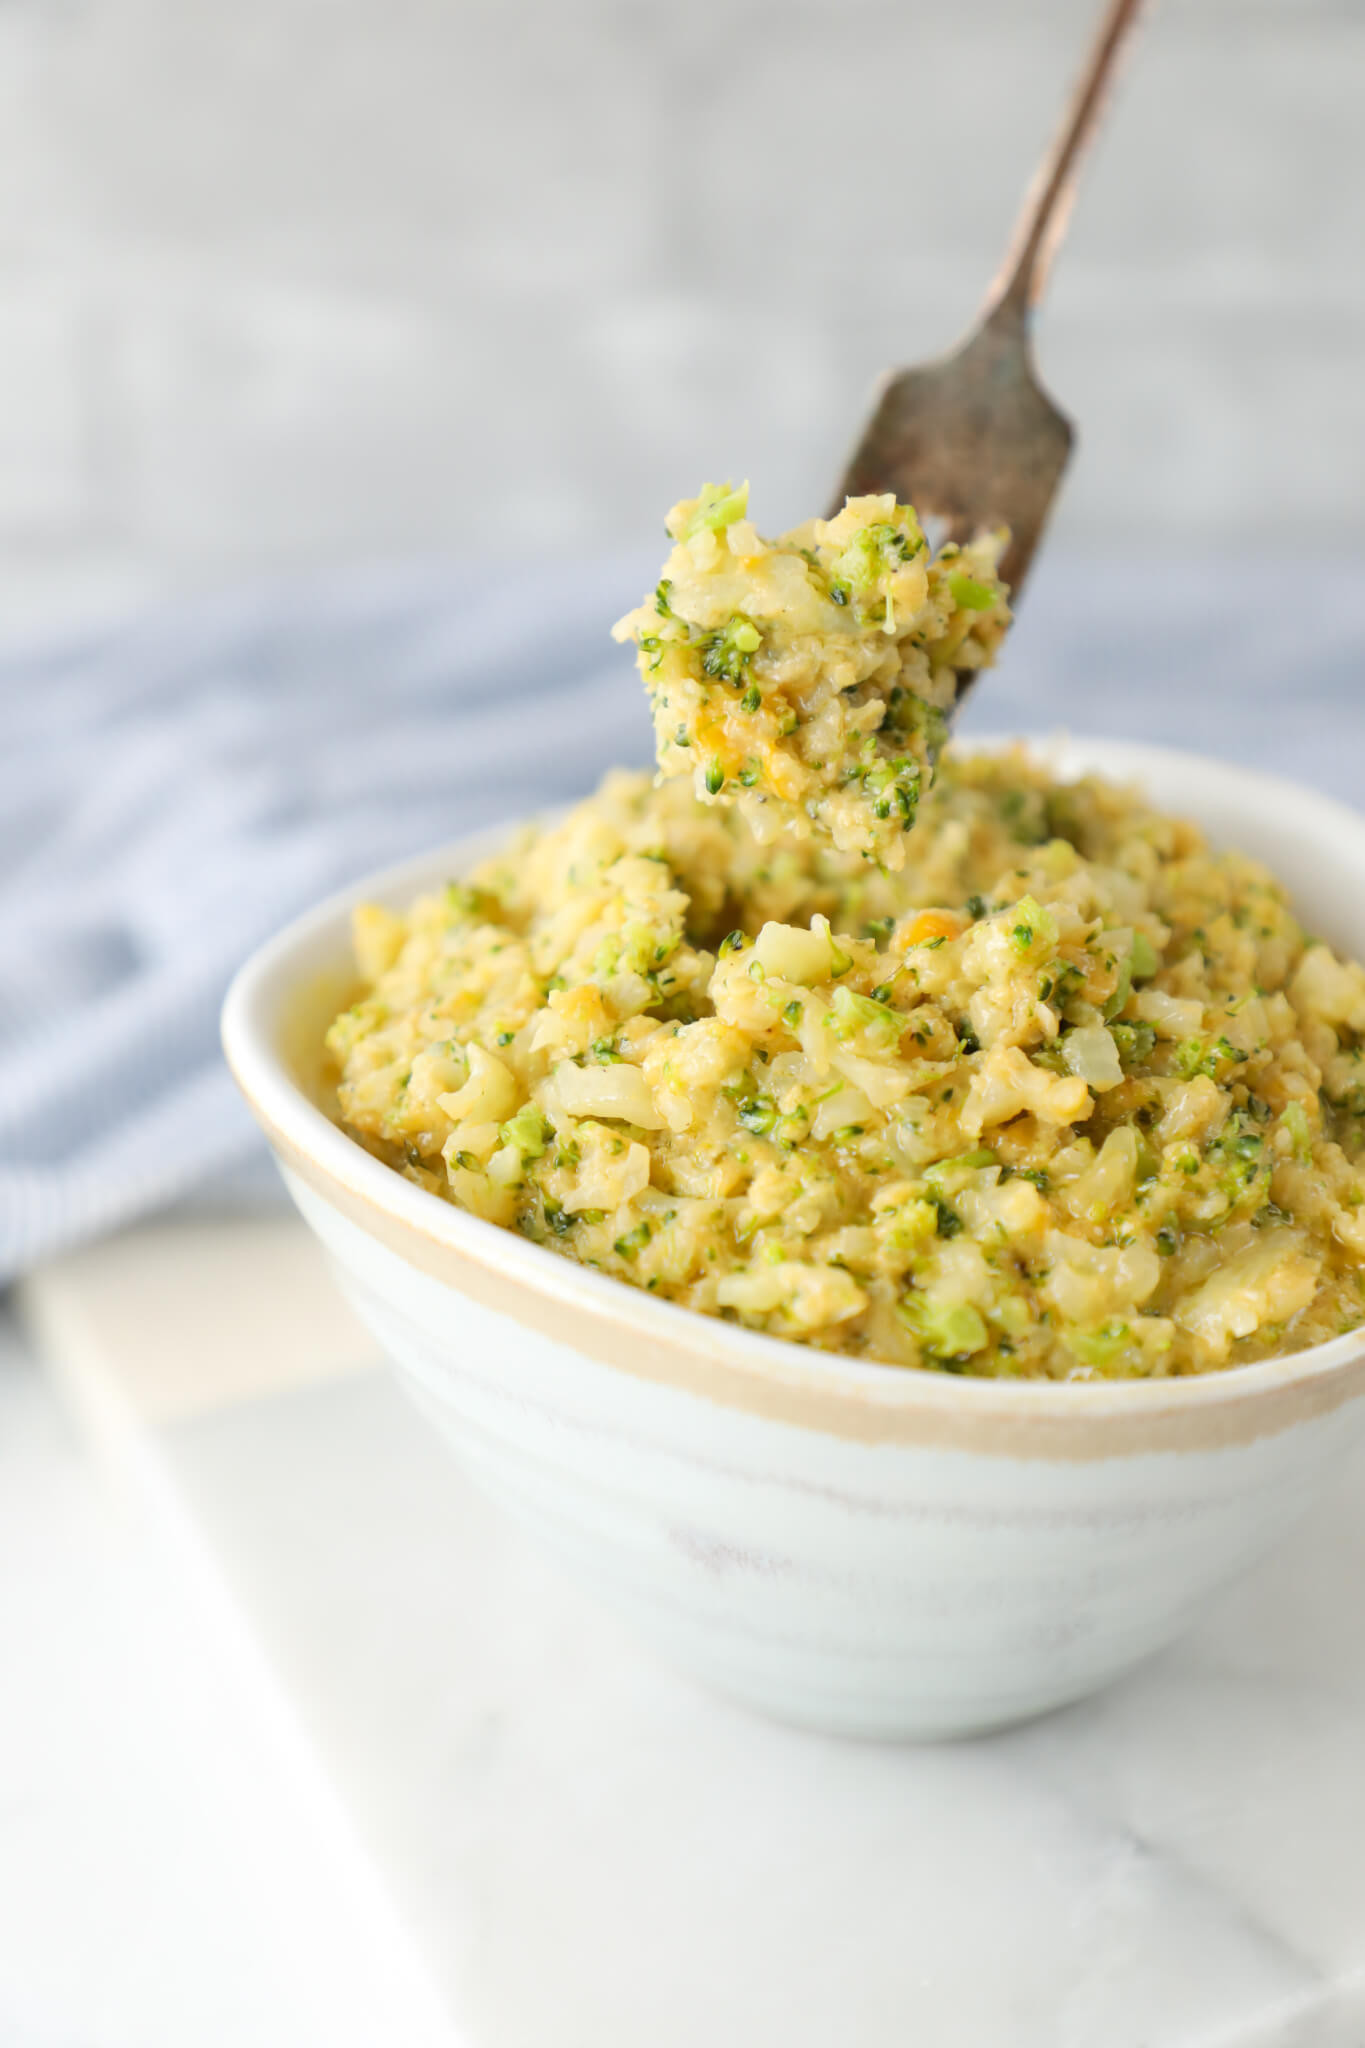 Cauliflower Keto Recipes Videos  Keto Cheesy Broccoli & Cauliflower Rice